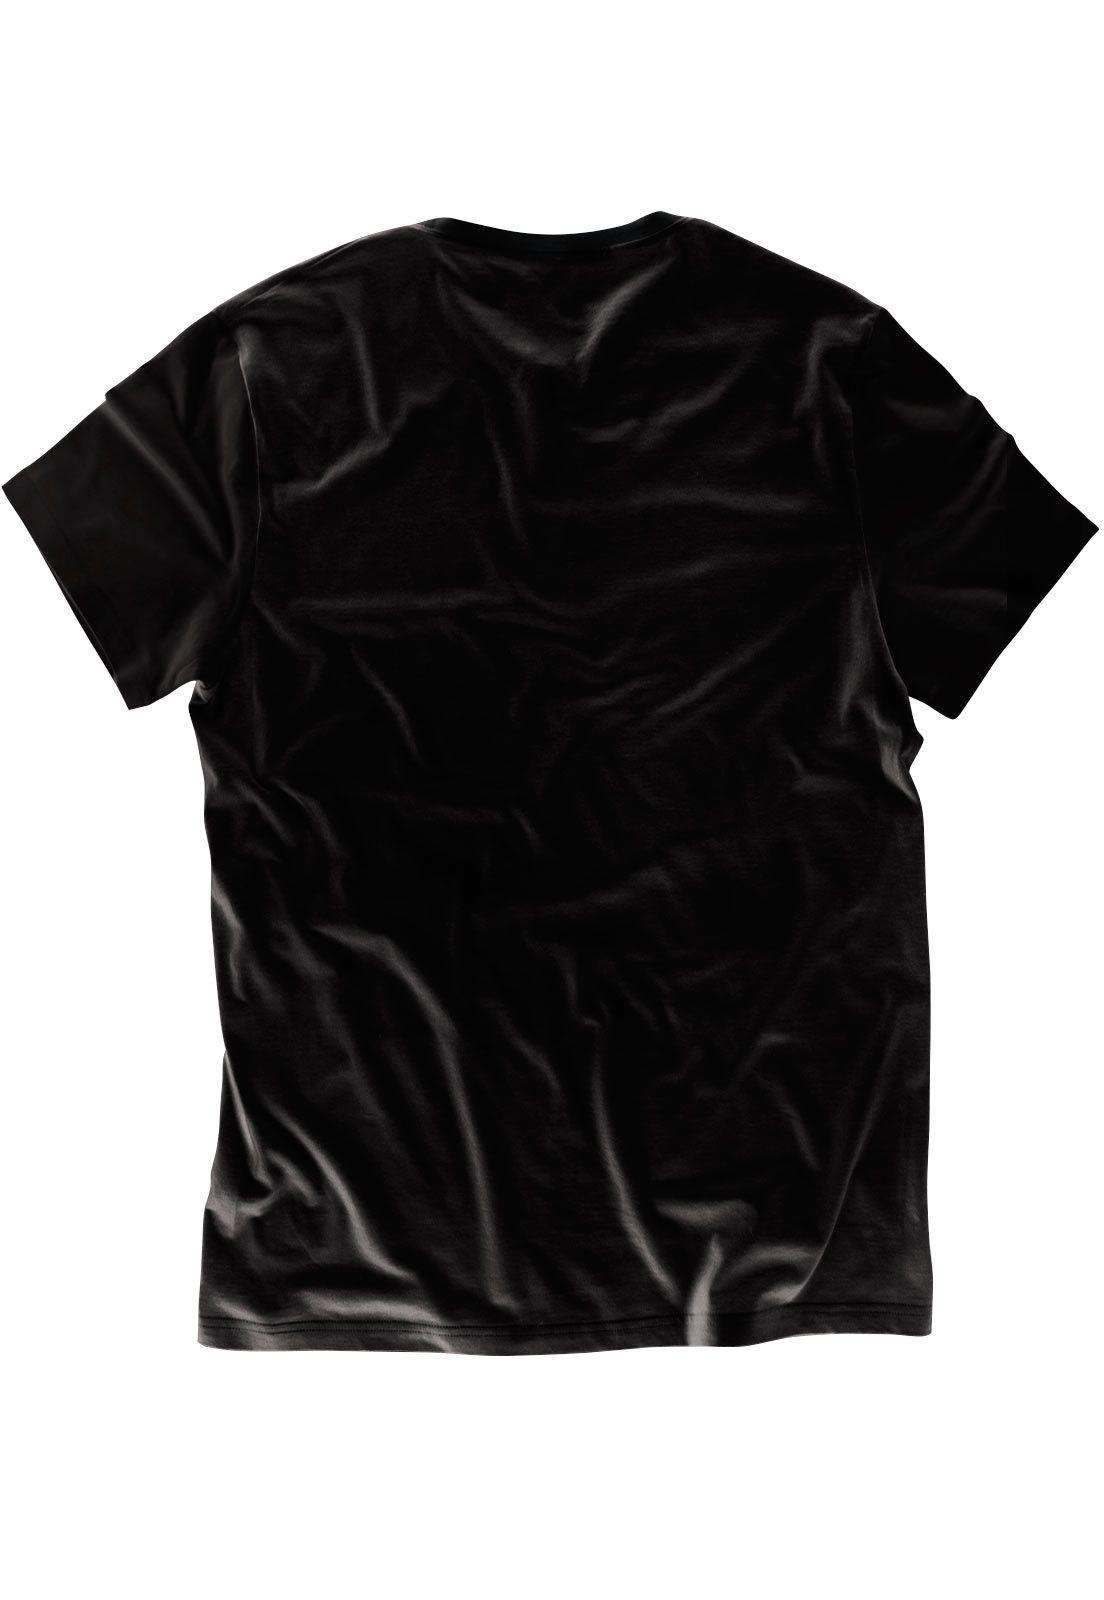 Camiseta Floral ElephunK Estampada Itália Florida Preta